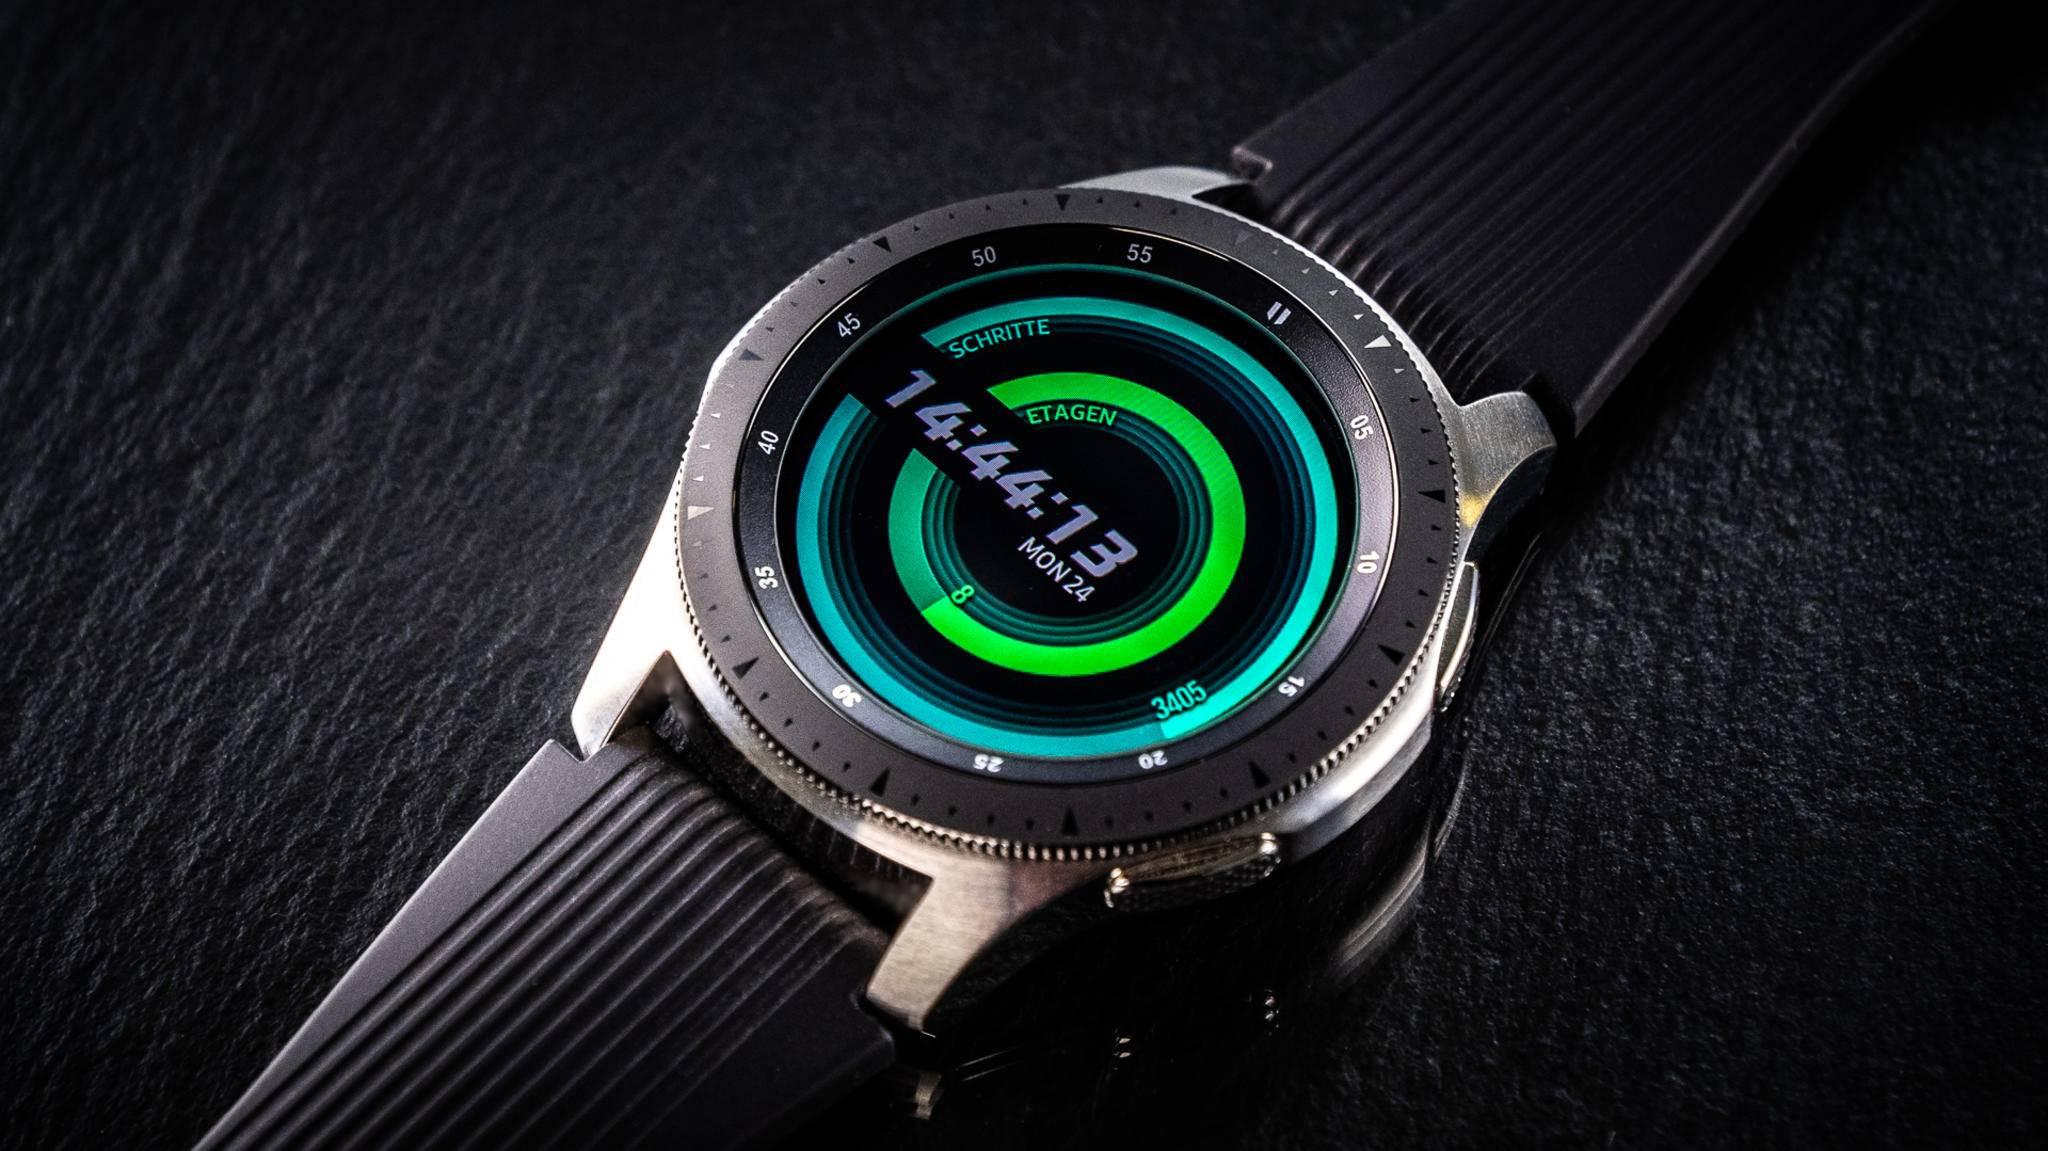 The new Samsung Galaxy Watch gets a Golf edition.